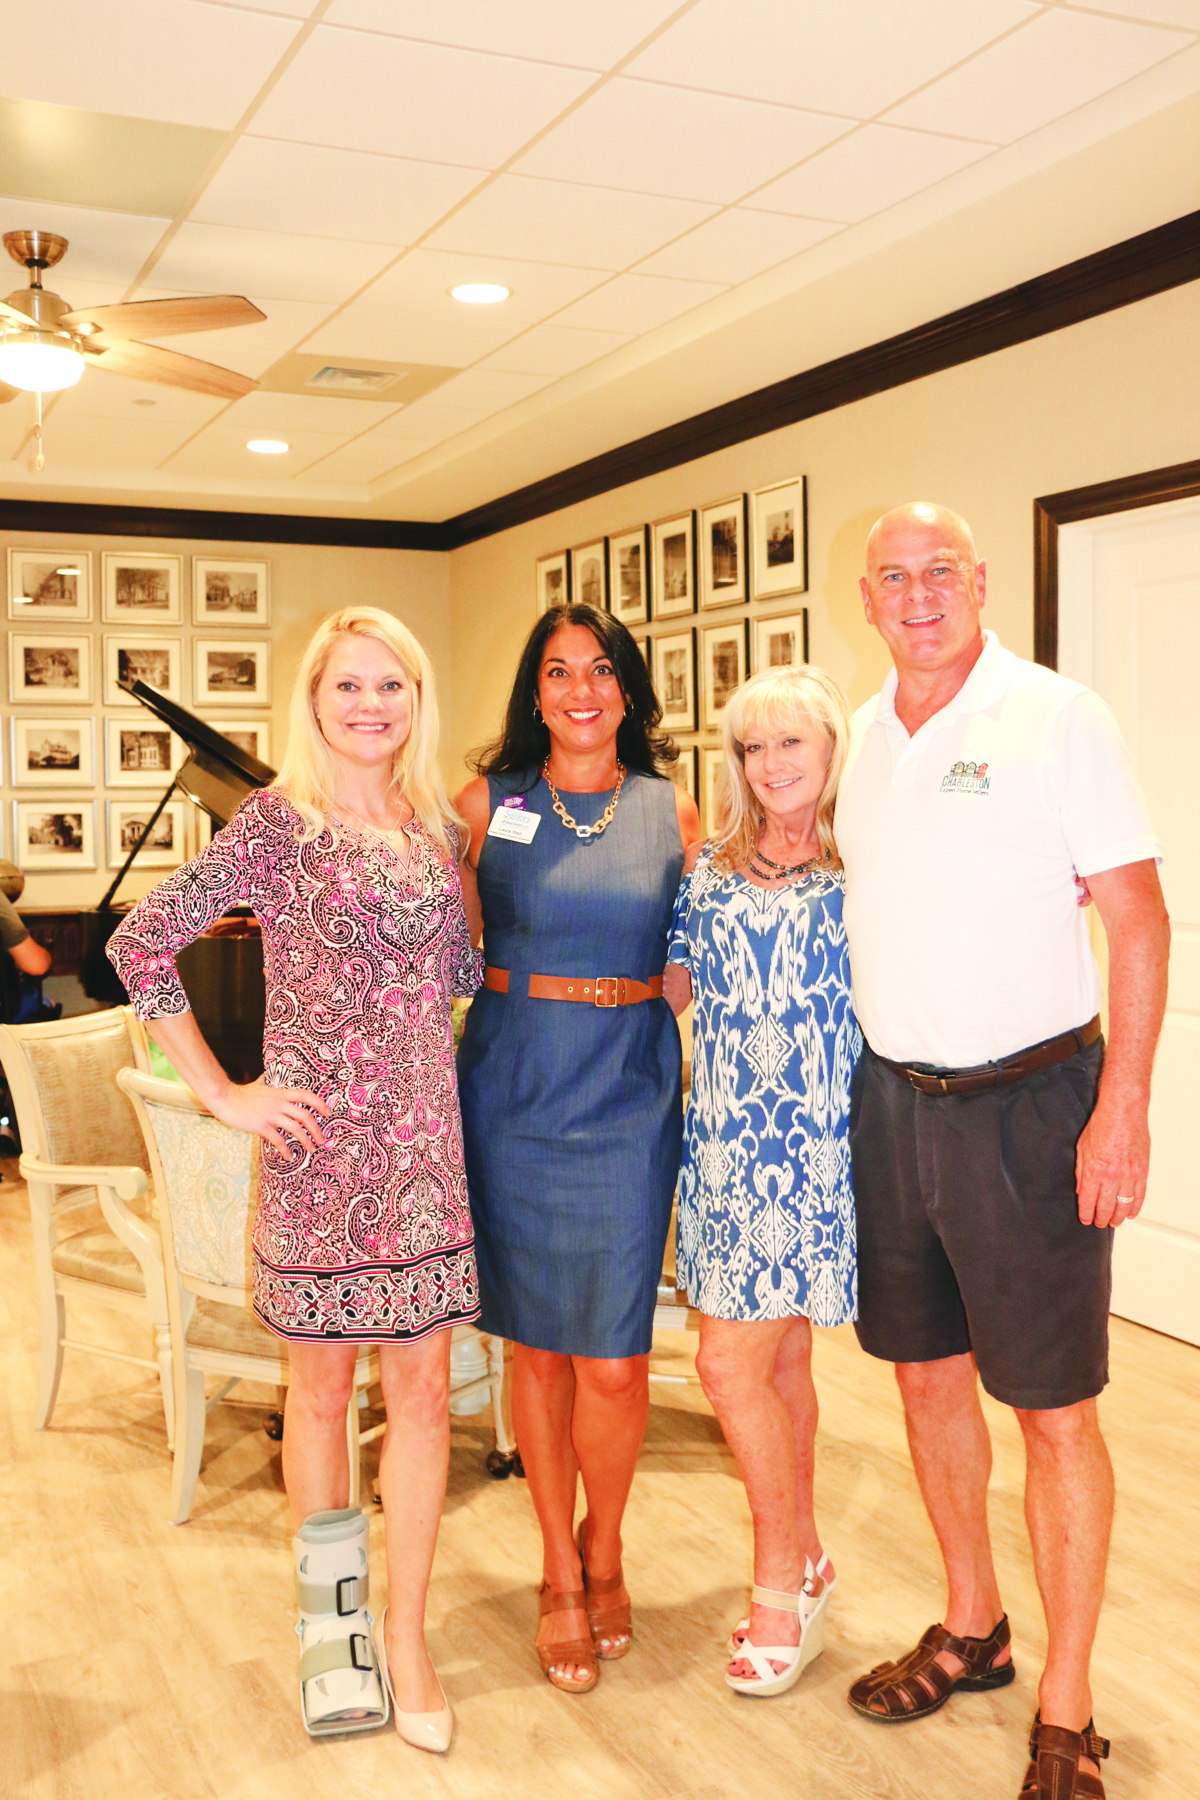 Tiffany Vanek, Laura Rayl, Tammy Cobb and Joel Cardwell.